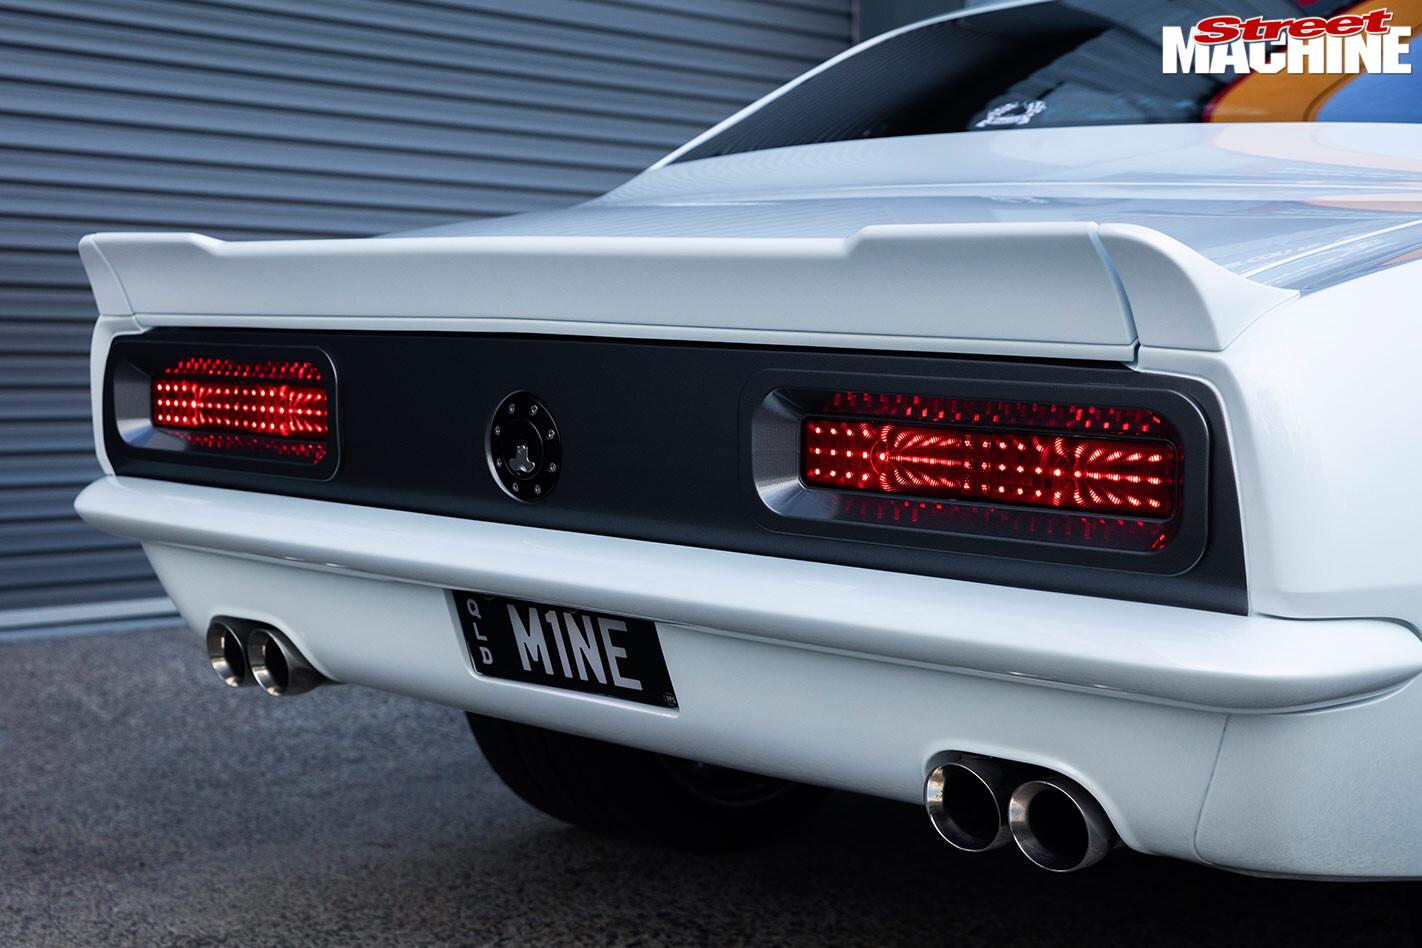 Chev Camaro tail lights